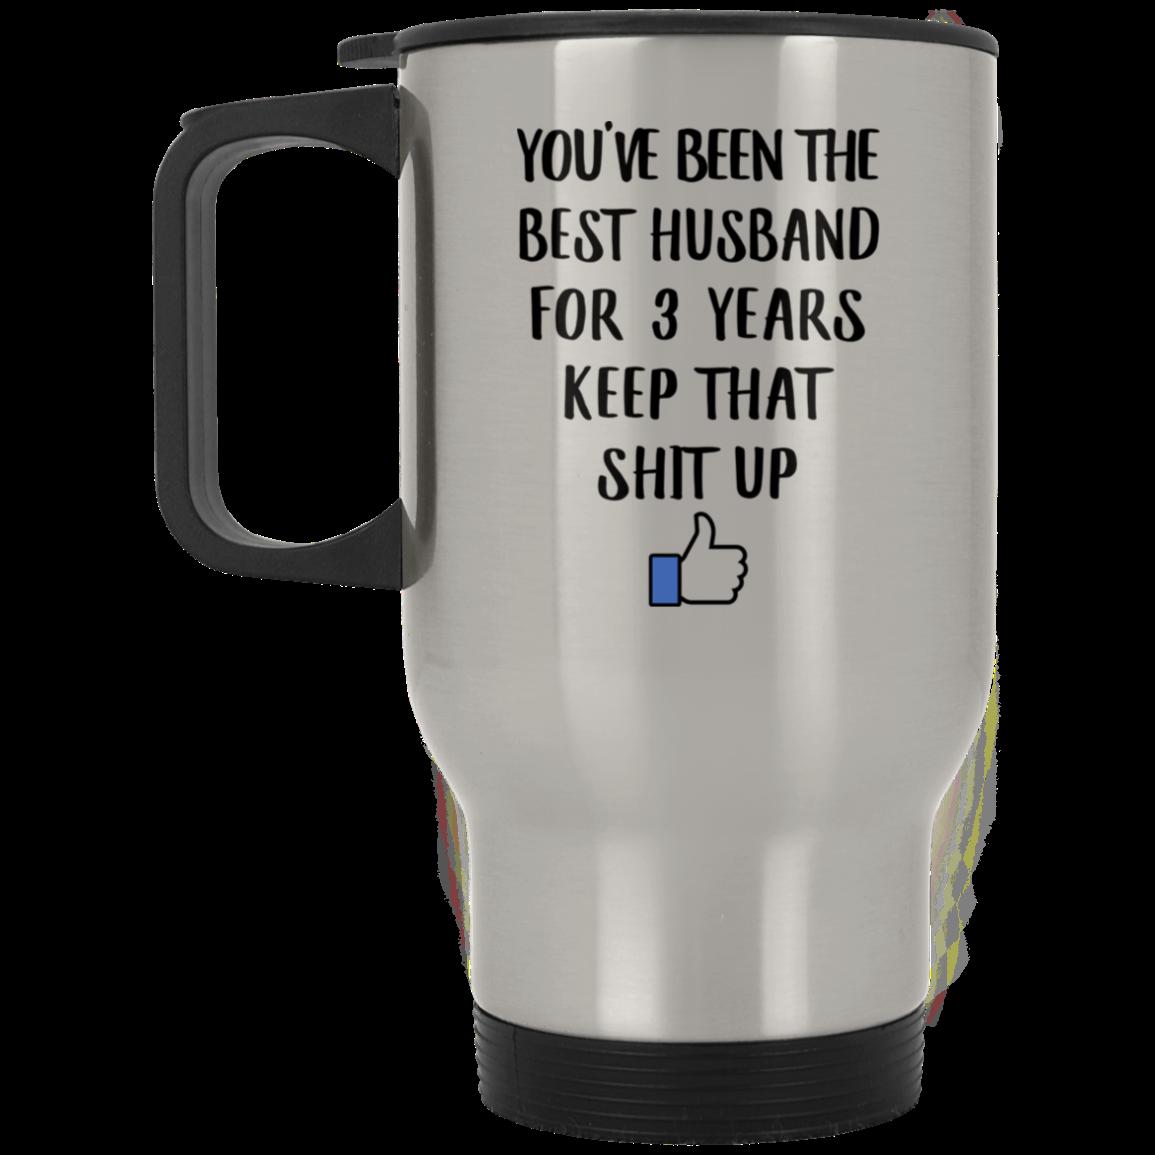 3 Year Anniversary Gift For Him 3th Yr Together Travel Mug